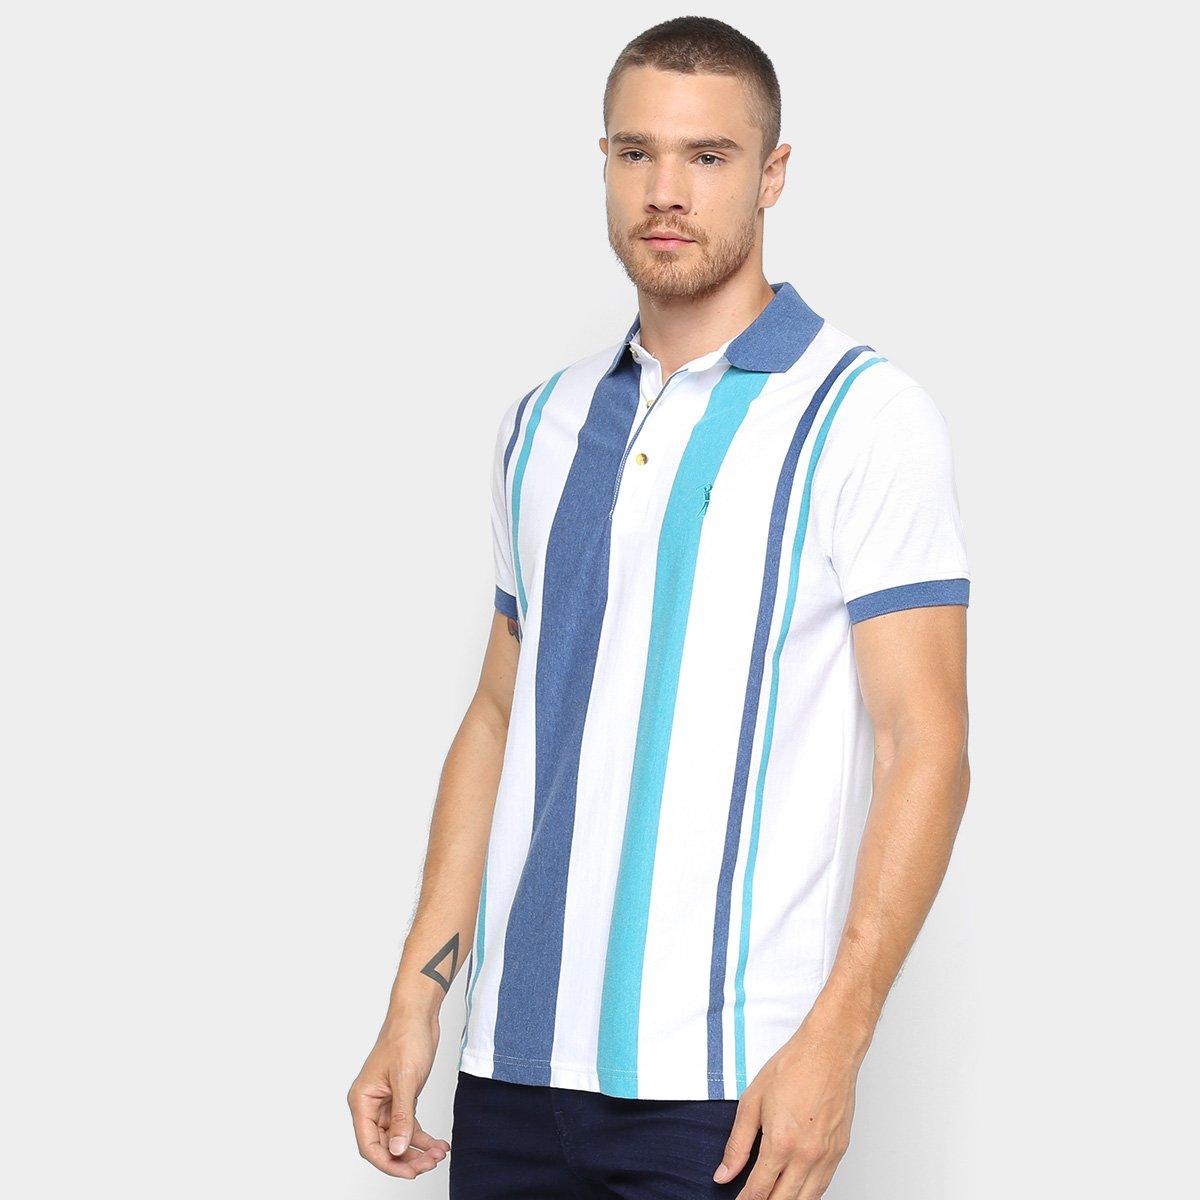 f891750954901 Camisa Polo Aleatory Fio Tinto Listrada Masculina - Azul e Branco - Compre  Agora